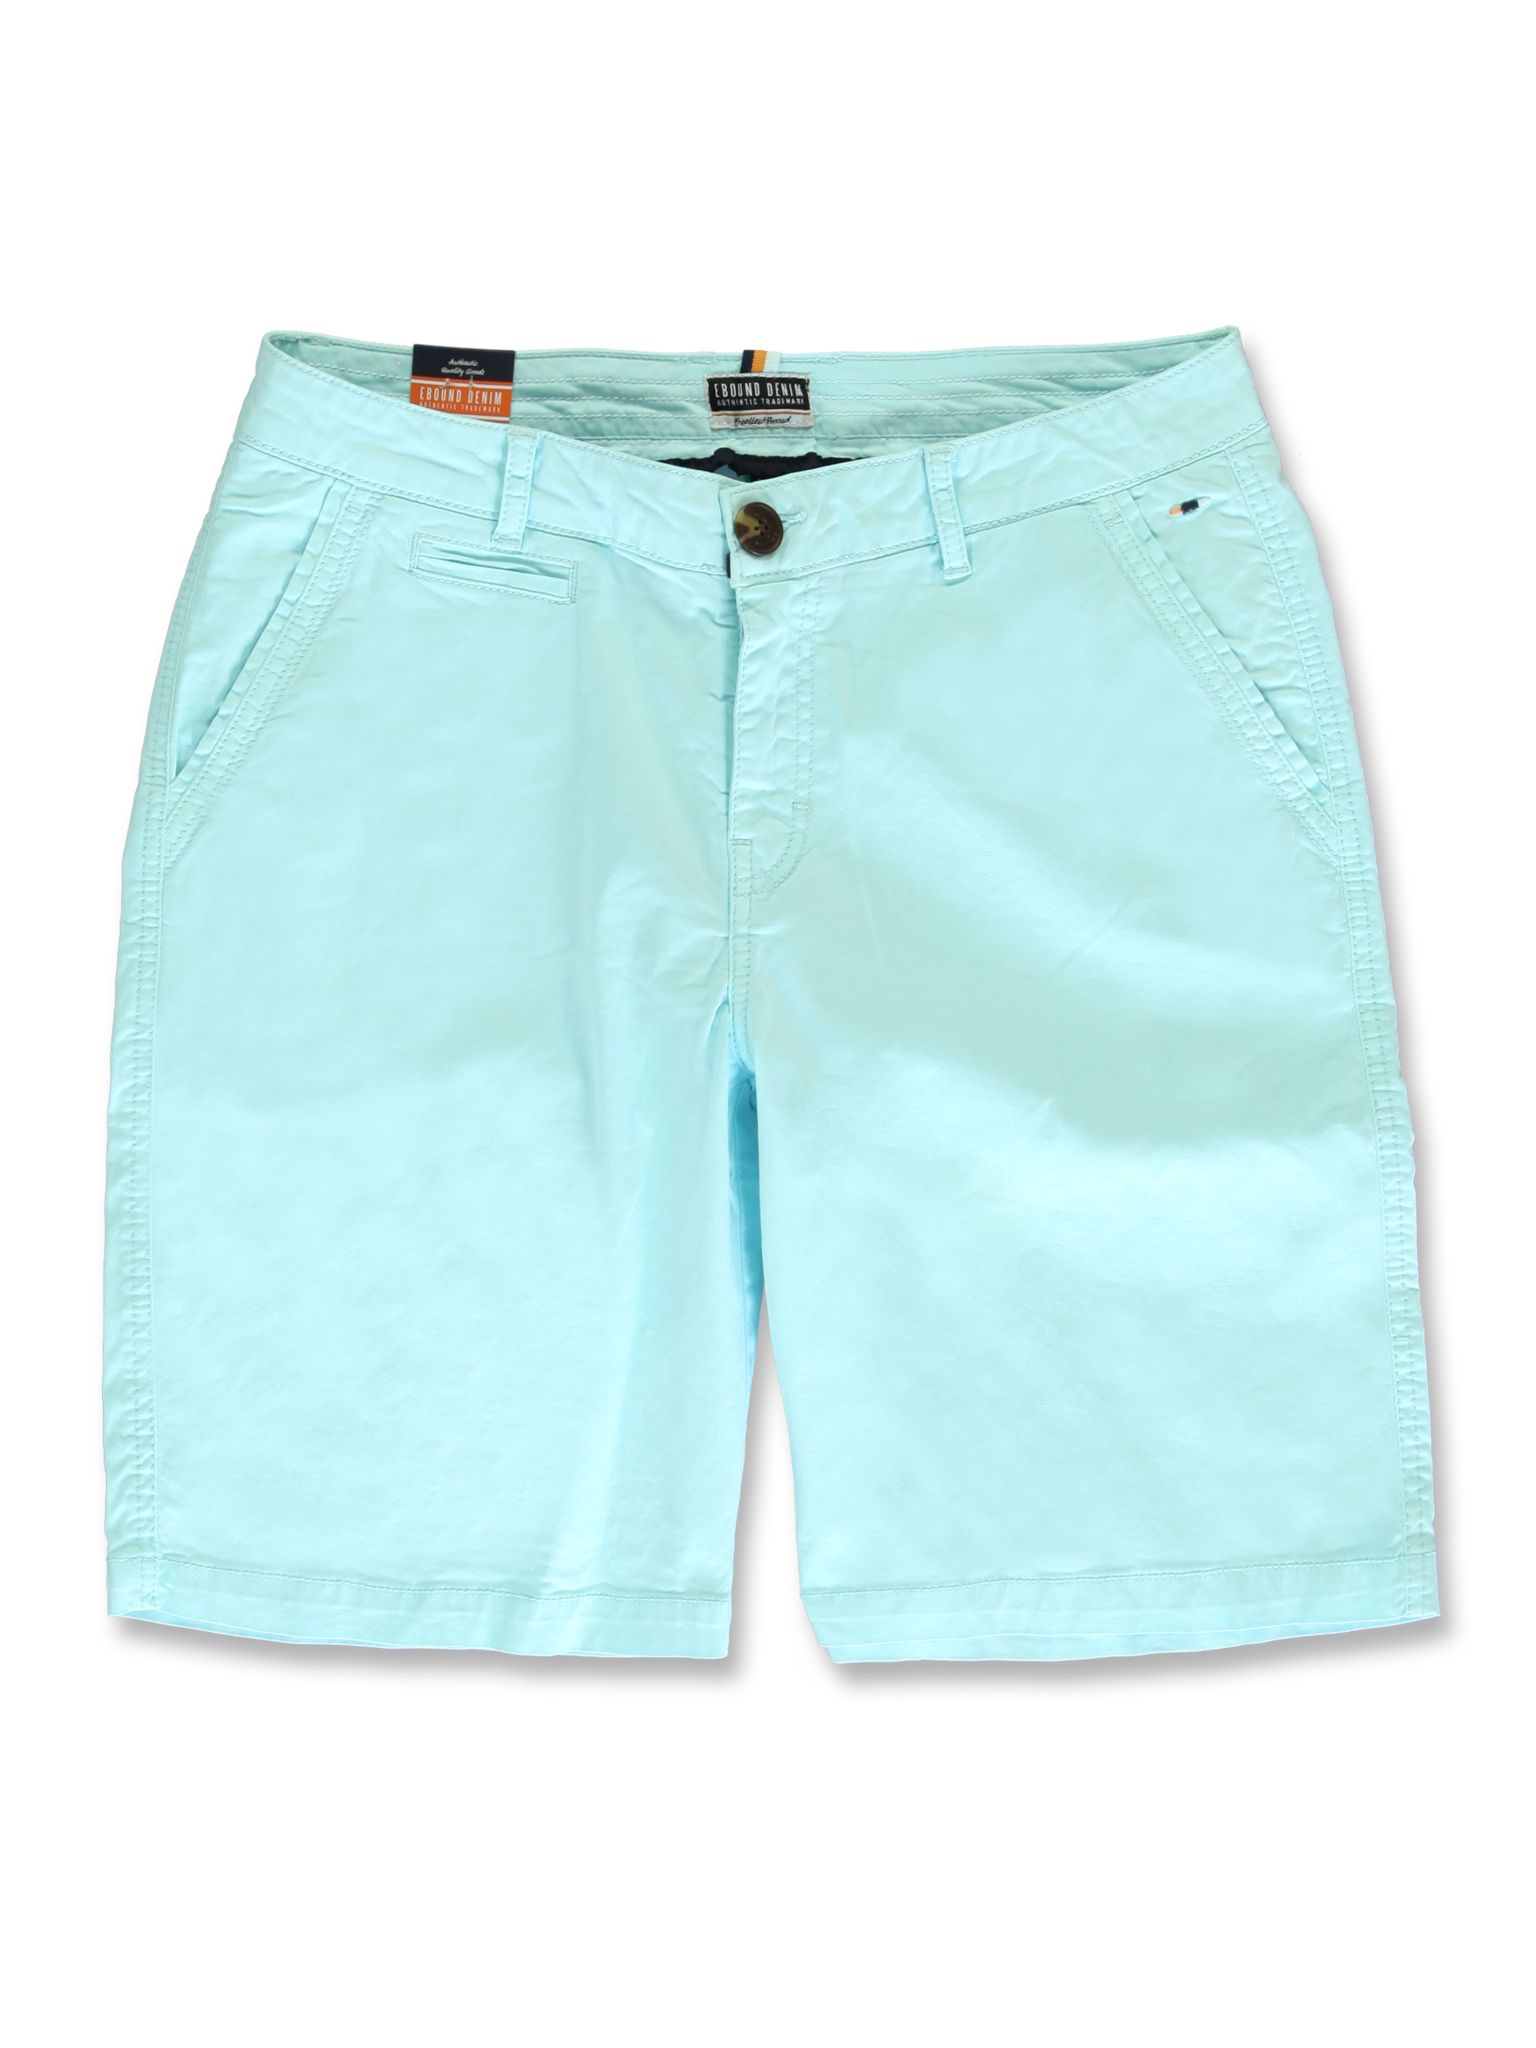 All Brands | Summerproducts Men | Bermuda | 24 pcs/box